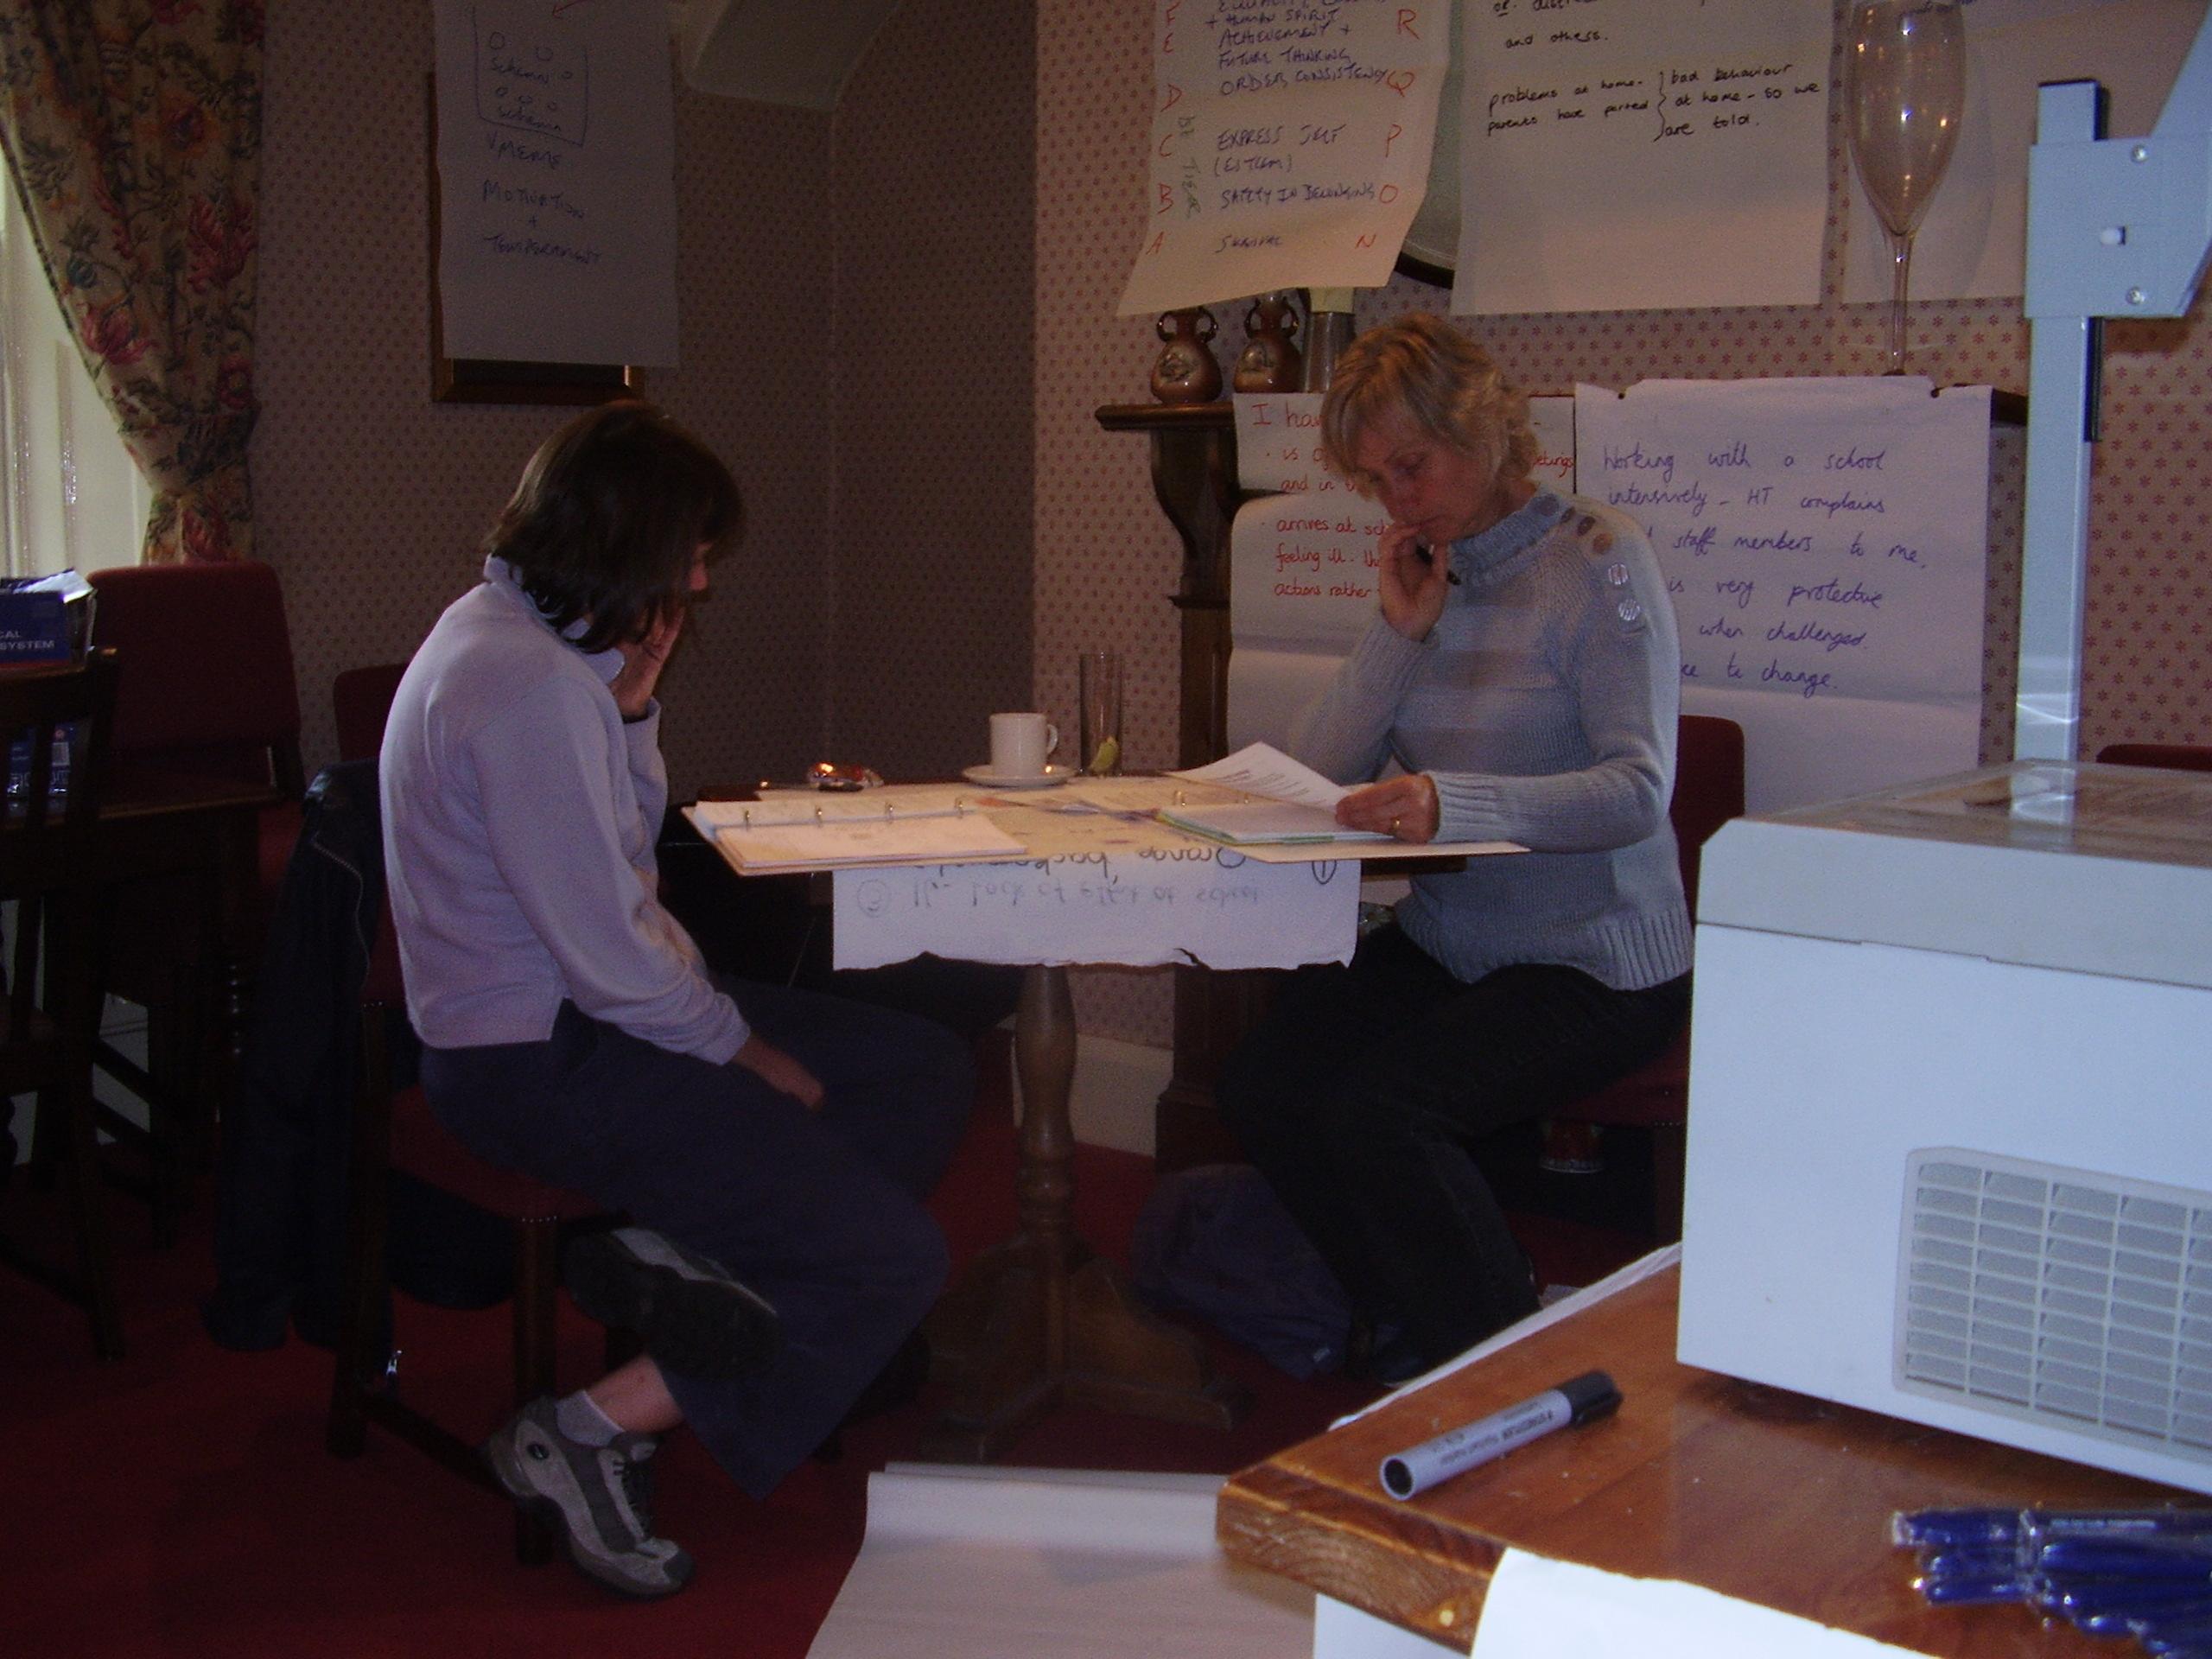 June 2007: Lynn Songhurst and Jane Lancaster (both Beckwithshaw Community Primary School, Harrogate) read through their case study